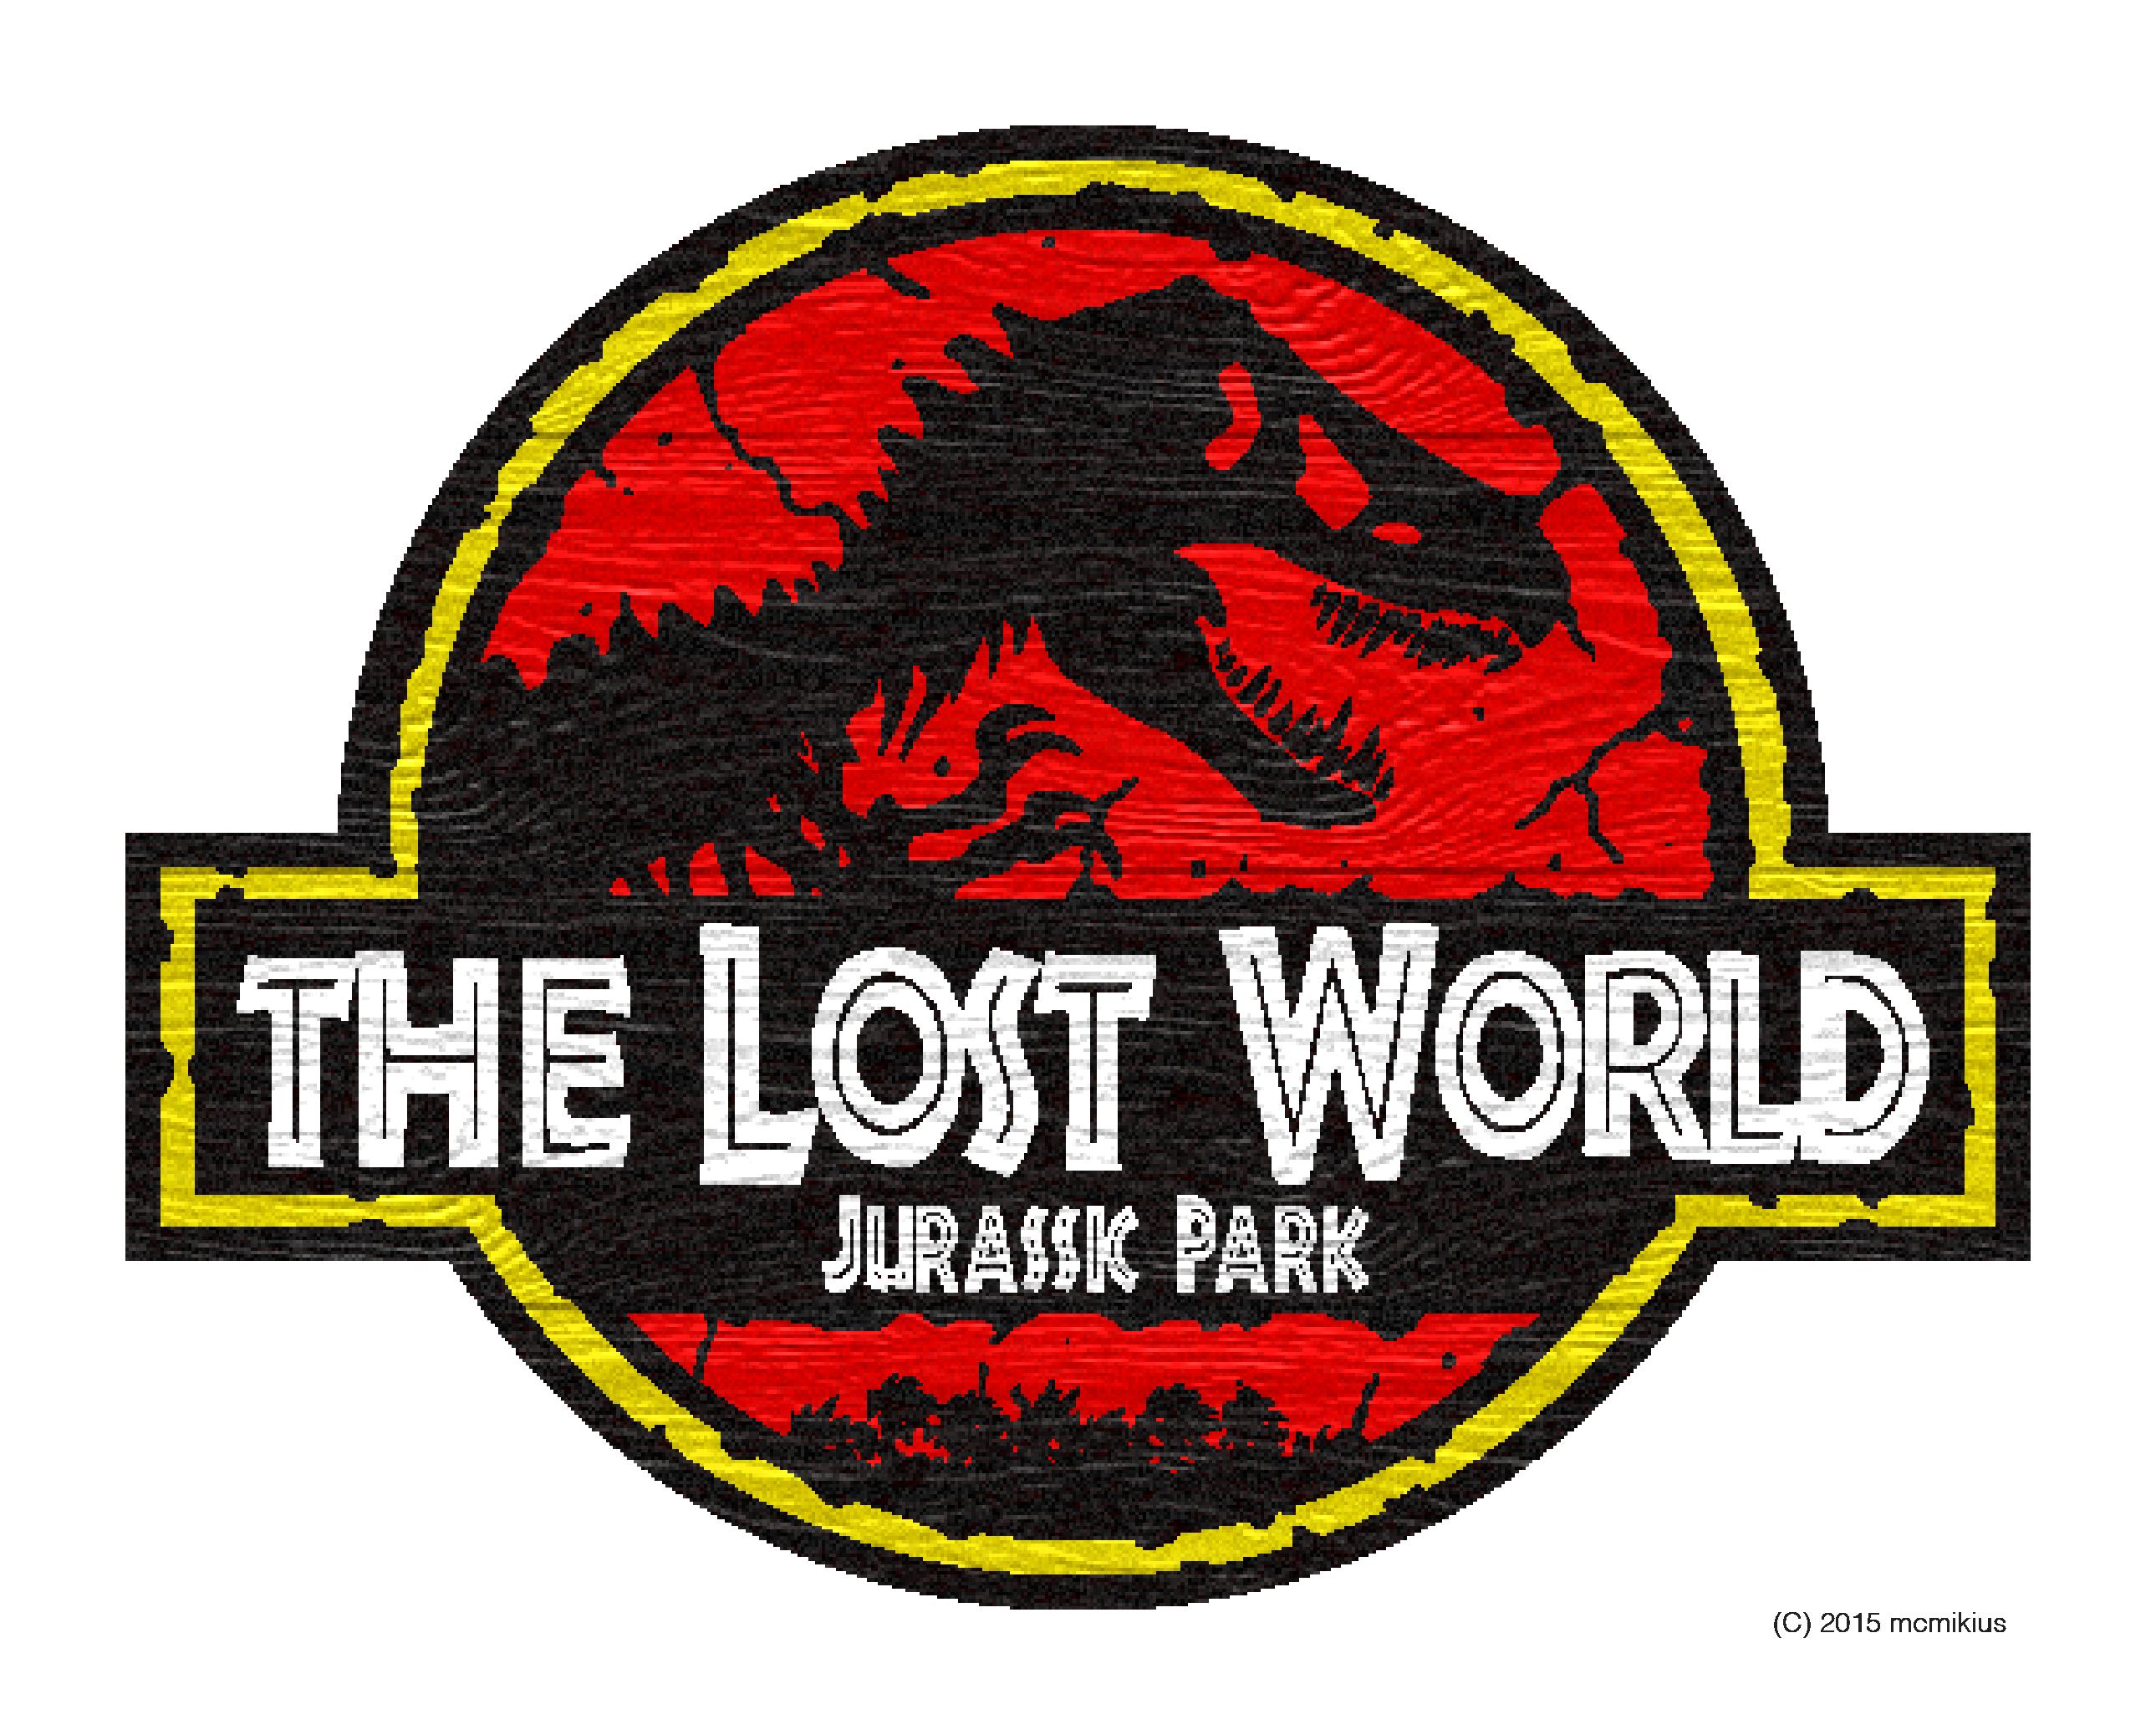 jurassic park logo - 997×802